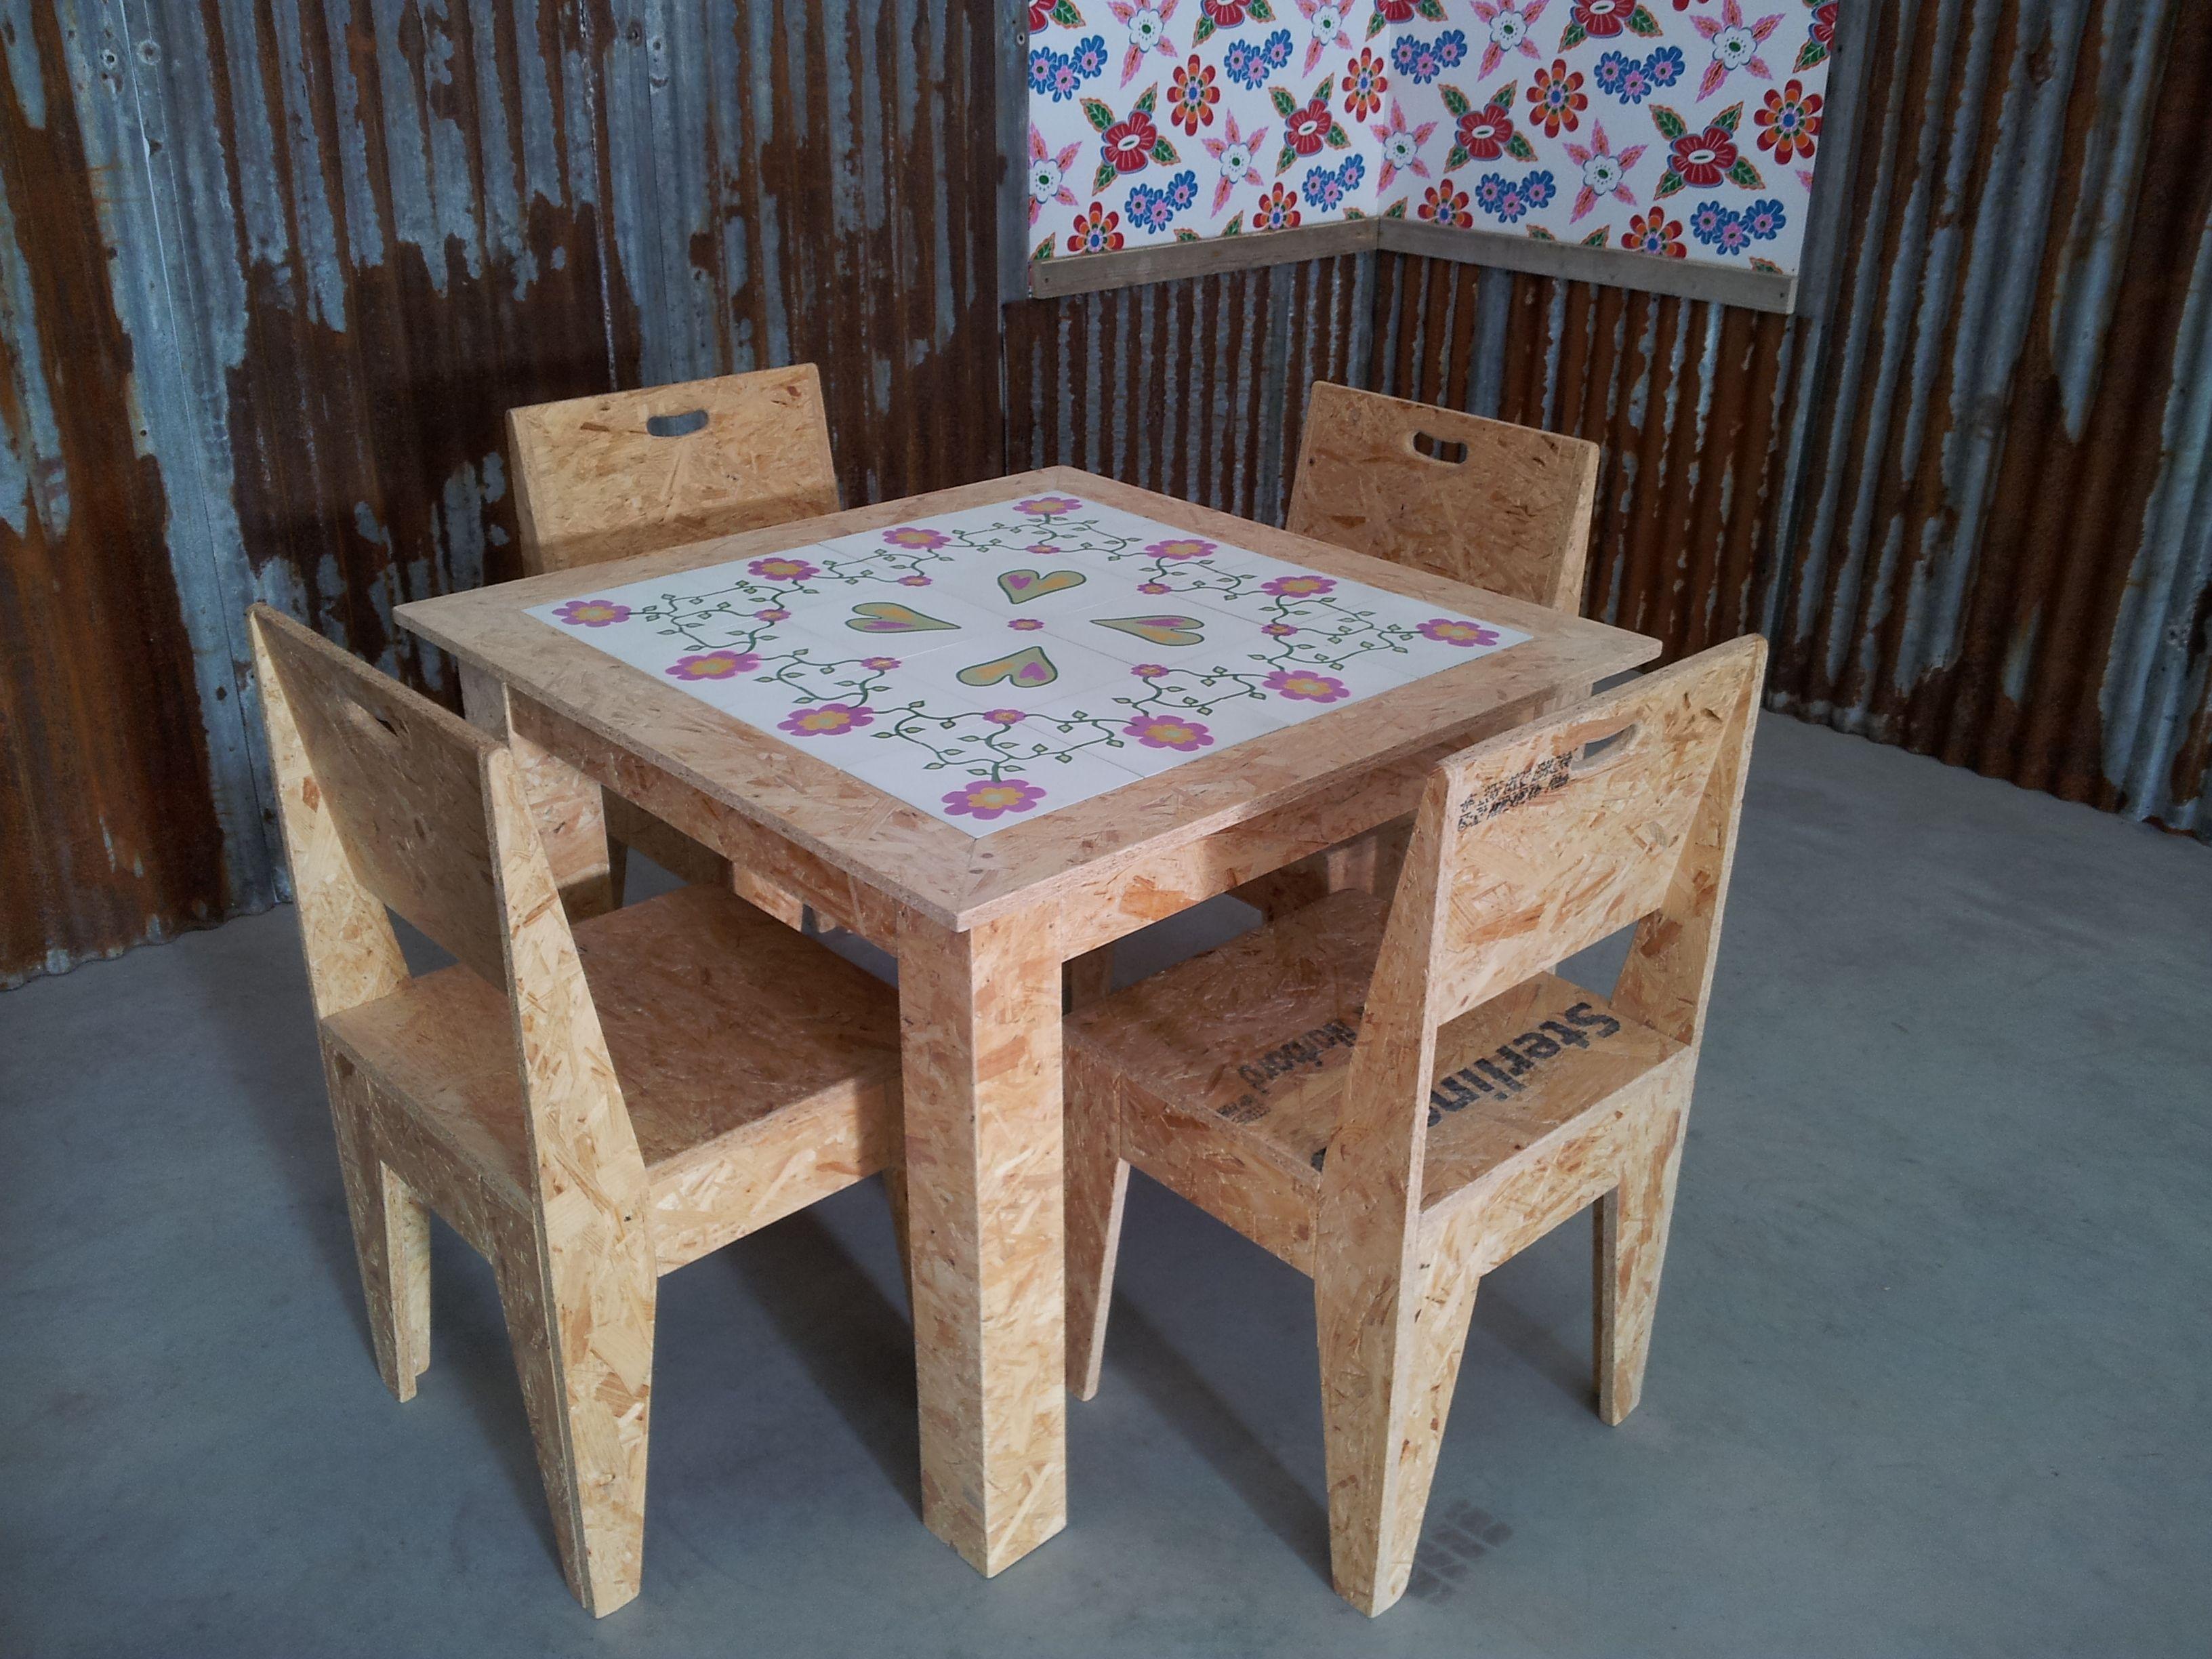 Osb tafel cool osb office in poland by modelina with osb tafel